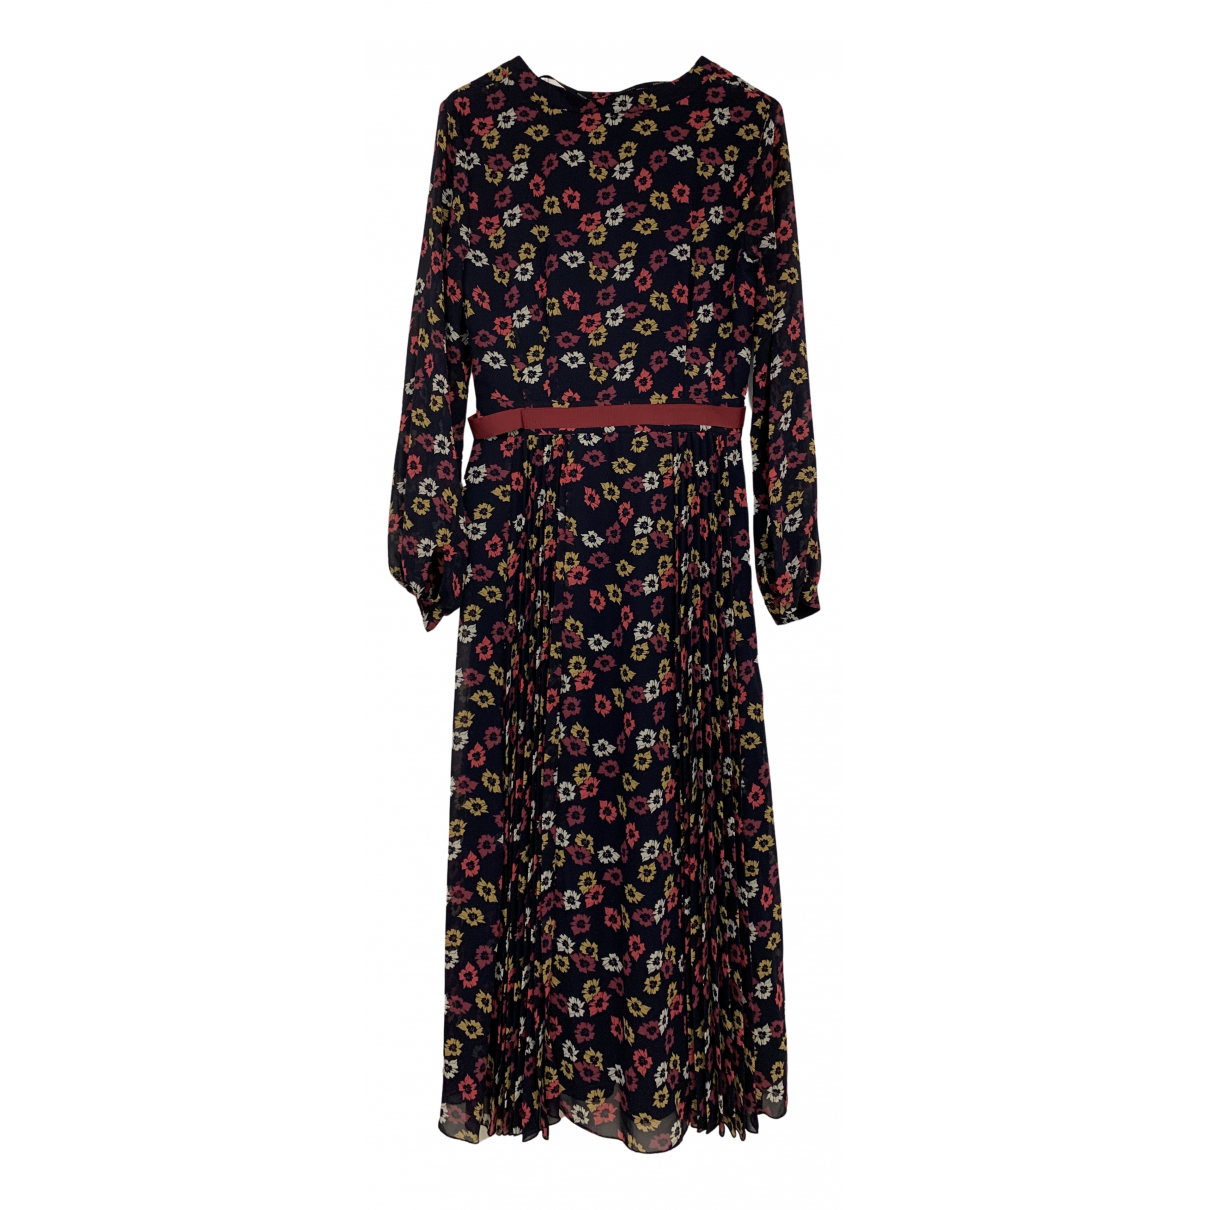 Tommy Hilfiger \N Kleid in  Blau Polyester